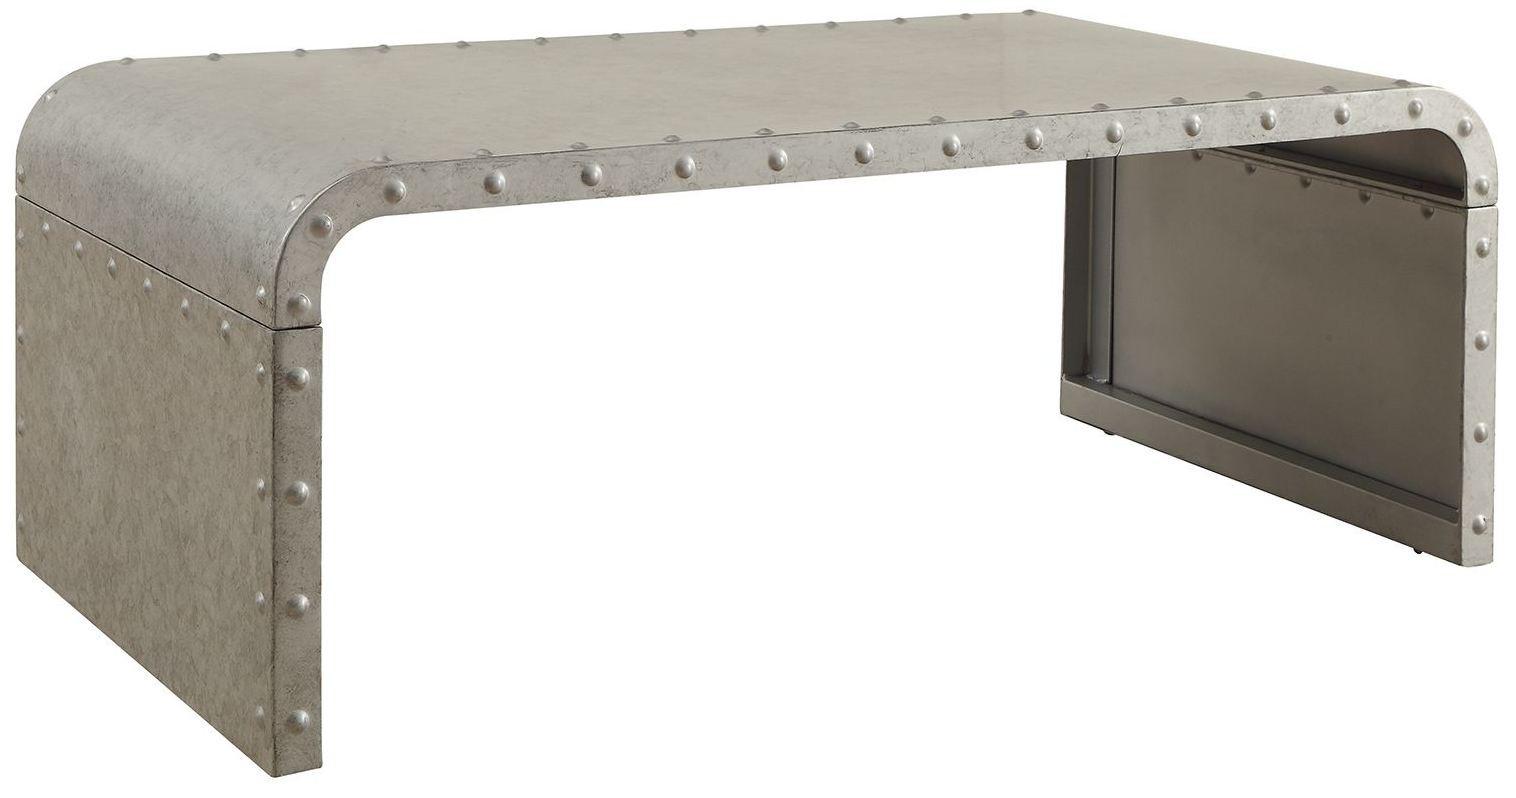 Galvanized Metal Coffee Table, 704348, Coaster Furniture